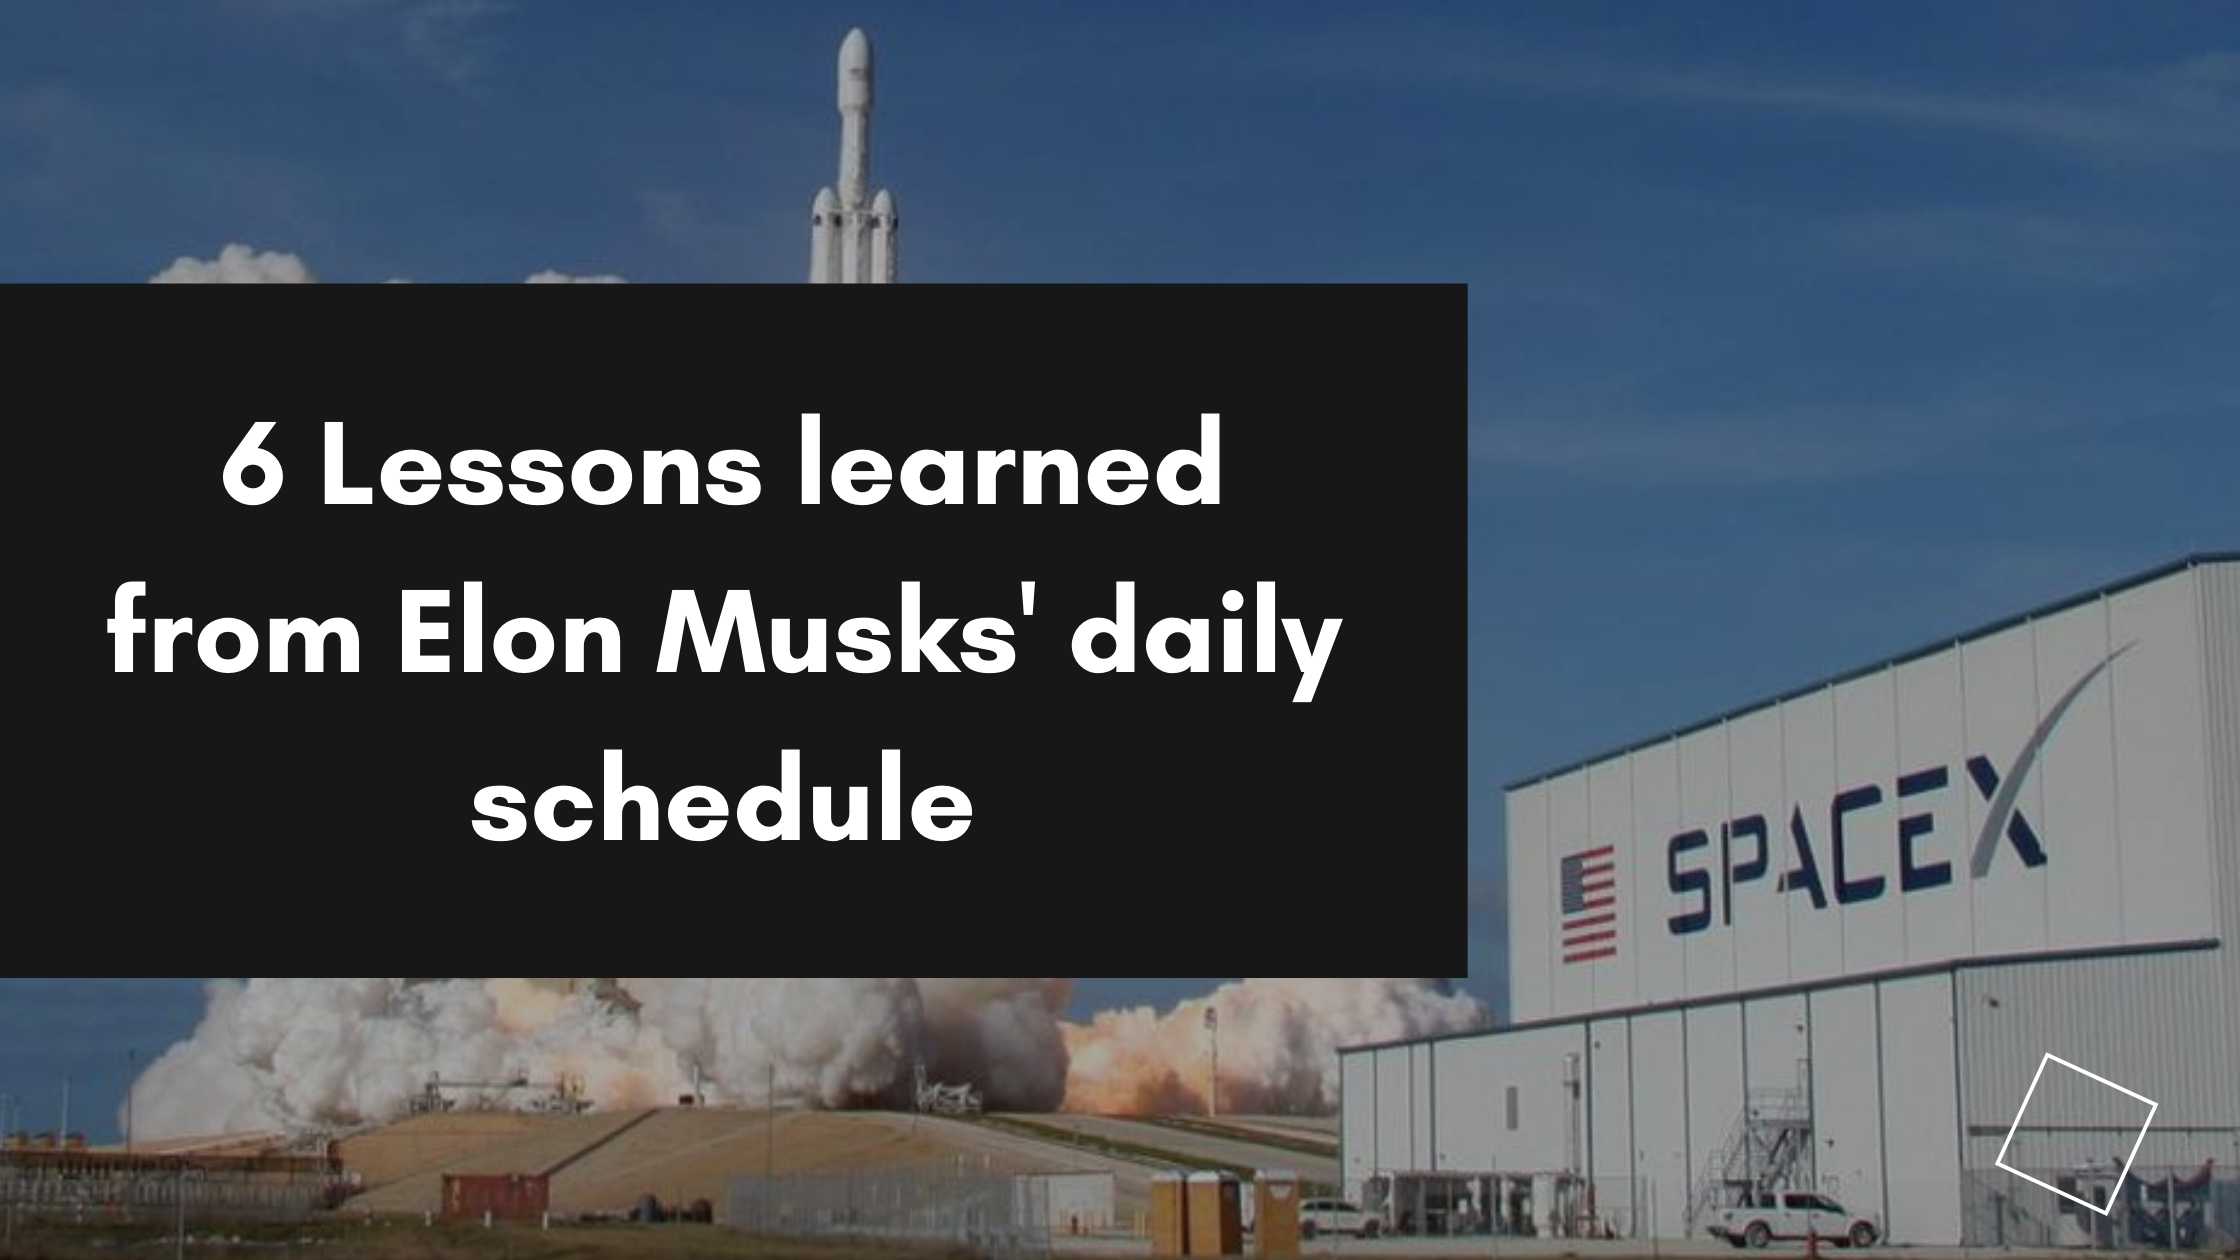 Elon Musk's daily schedule